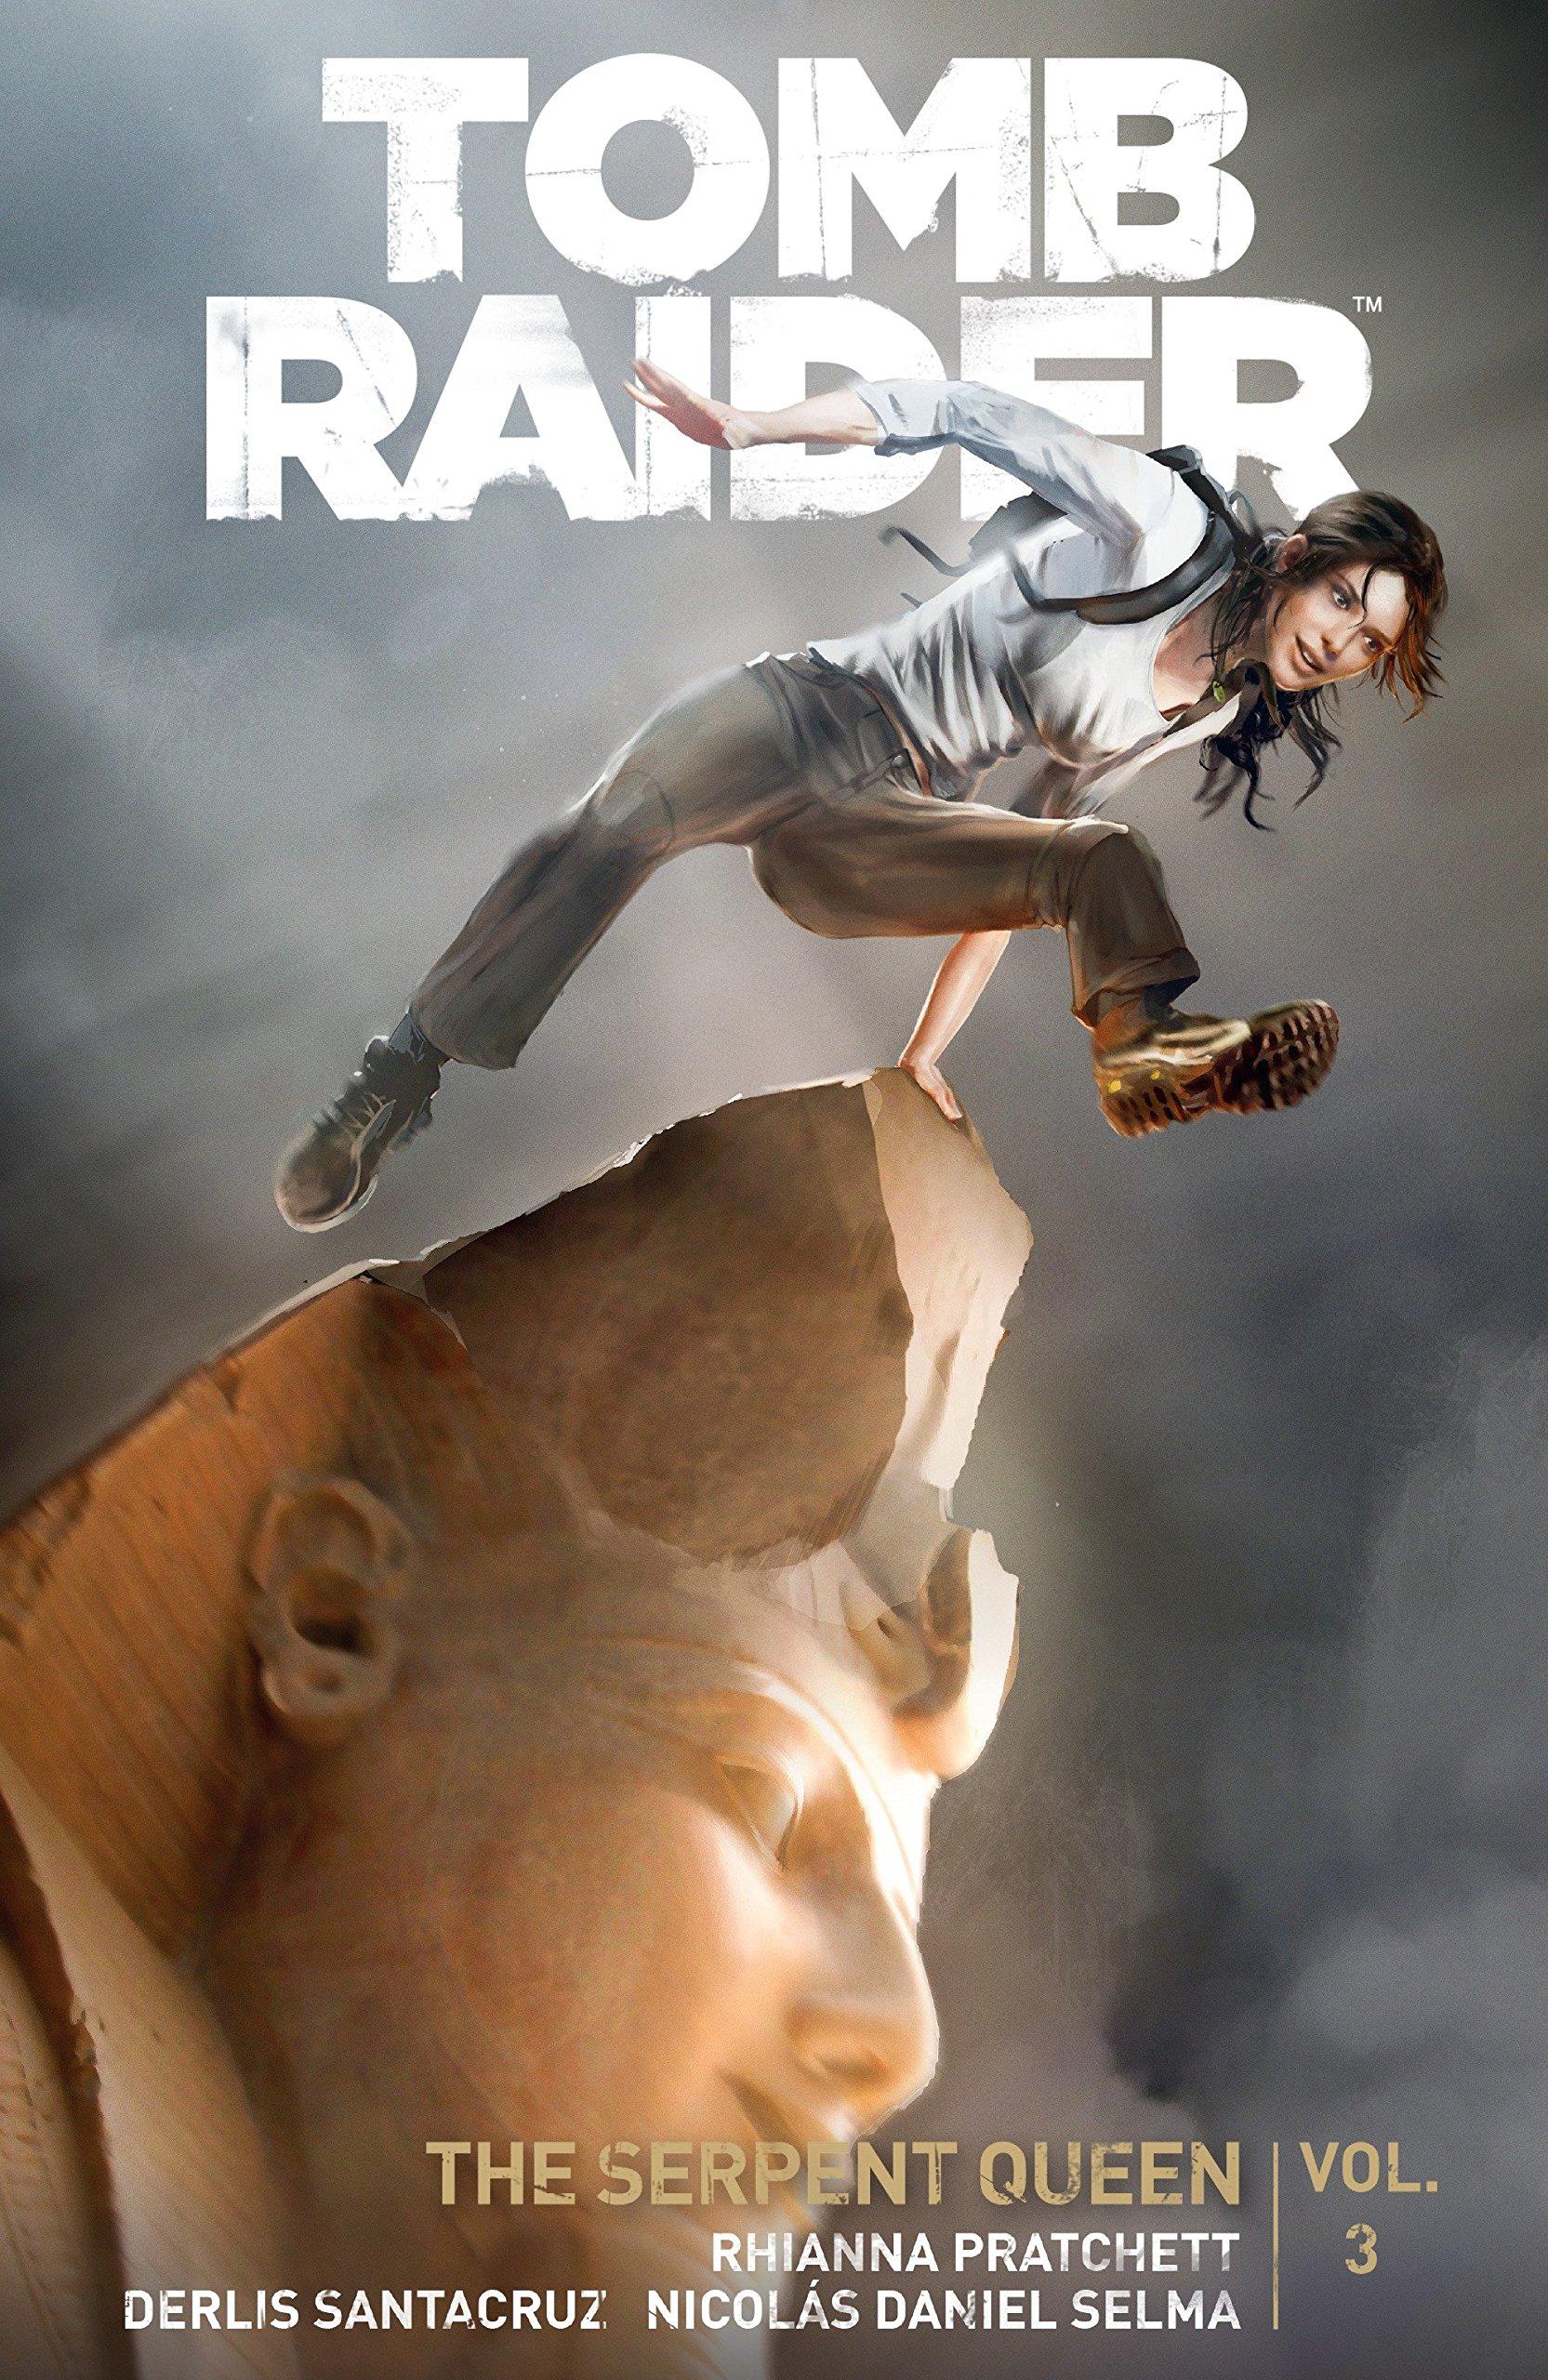 Tomb Raider Volume 3: Queen of Serpents: Rhianna Pratchett: 9781616558185:  Amazon.com: Books